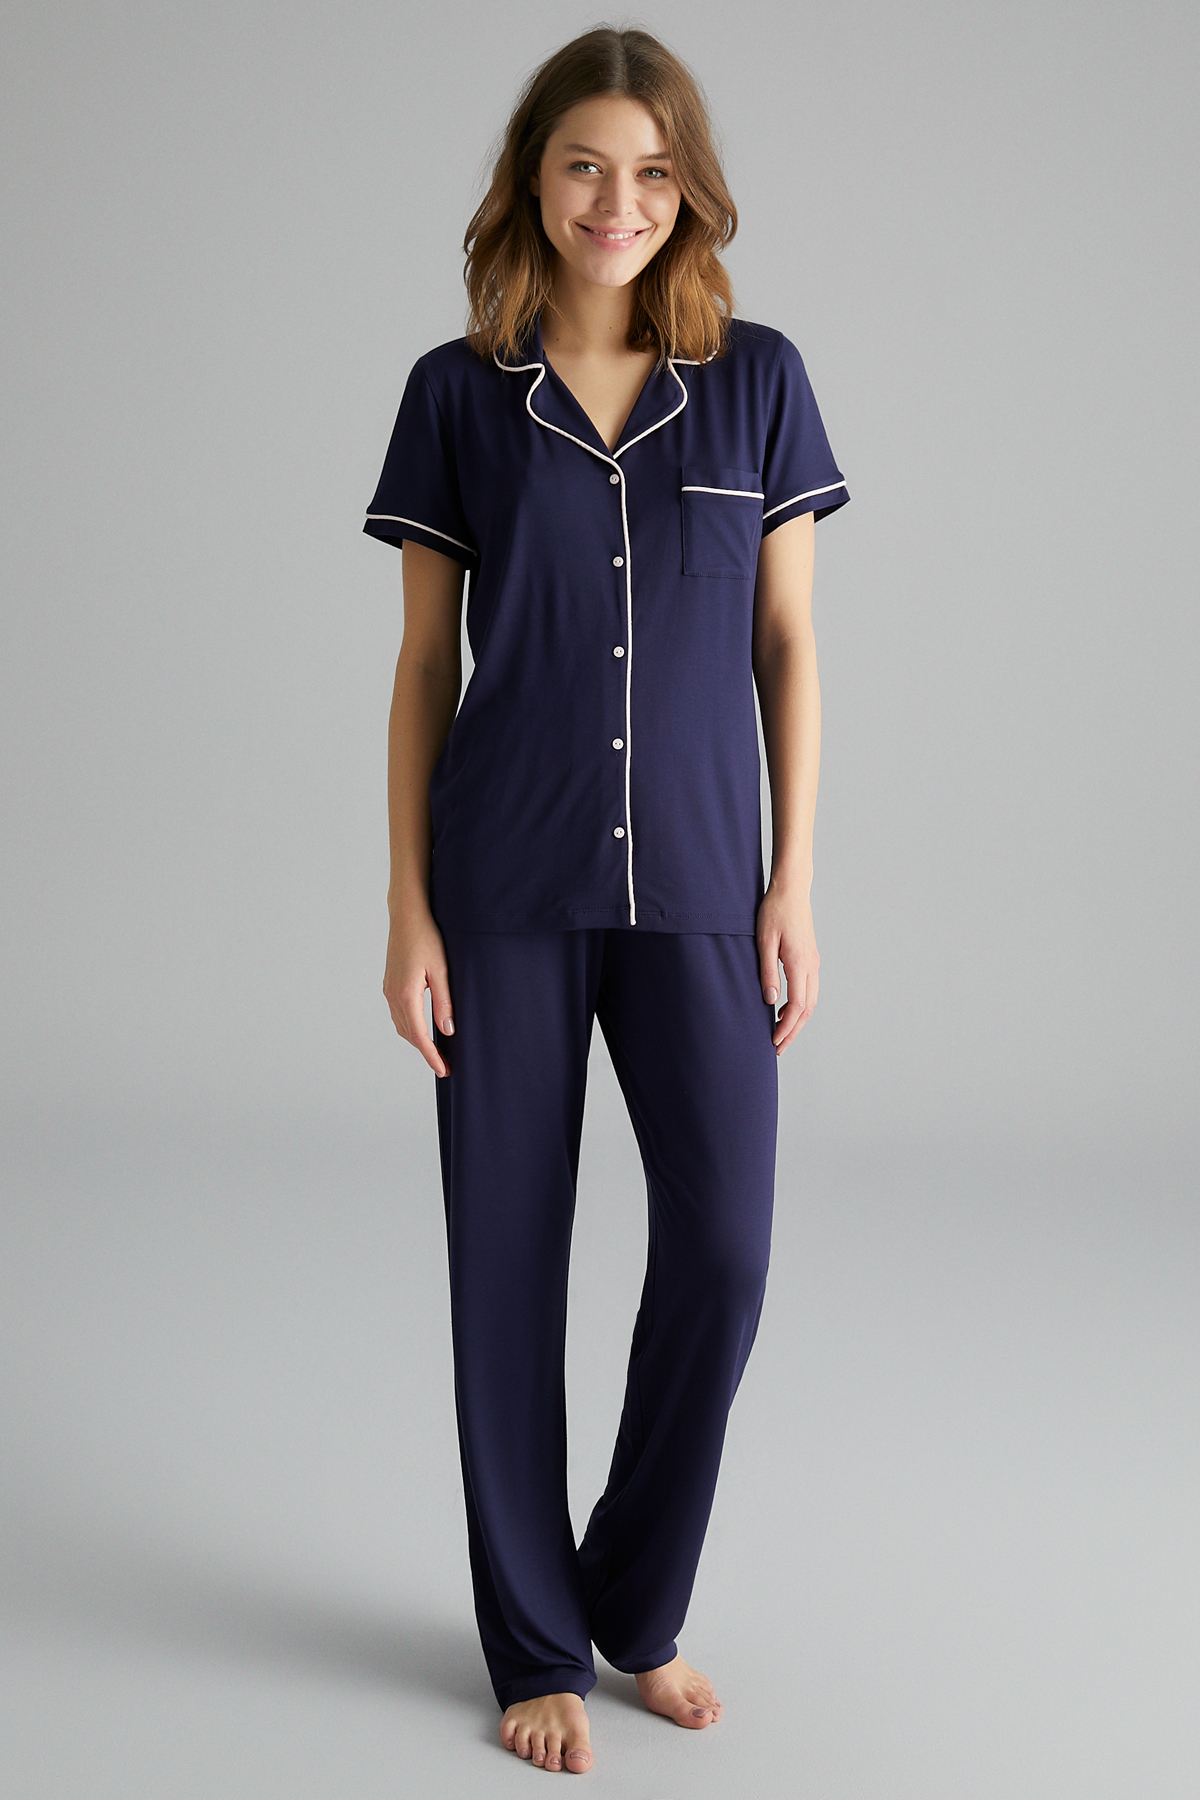 Gift Set Pijama